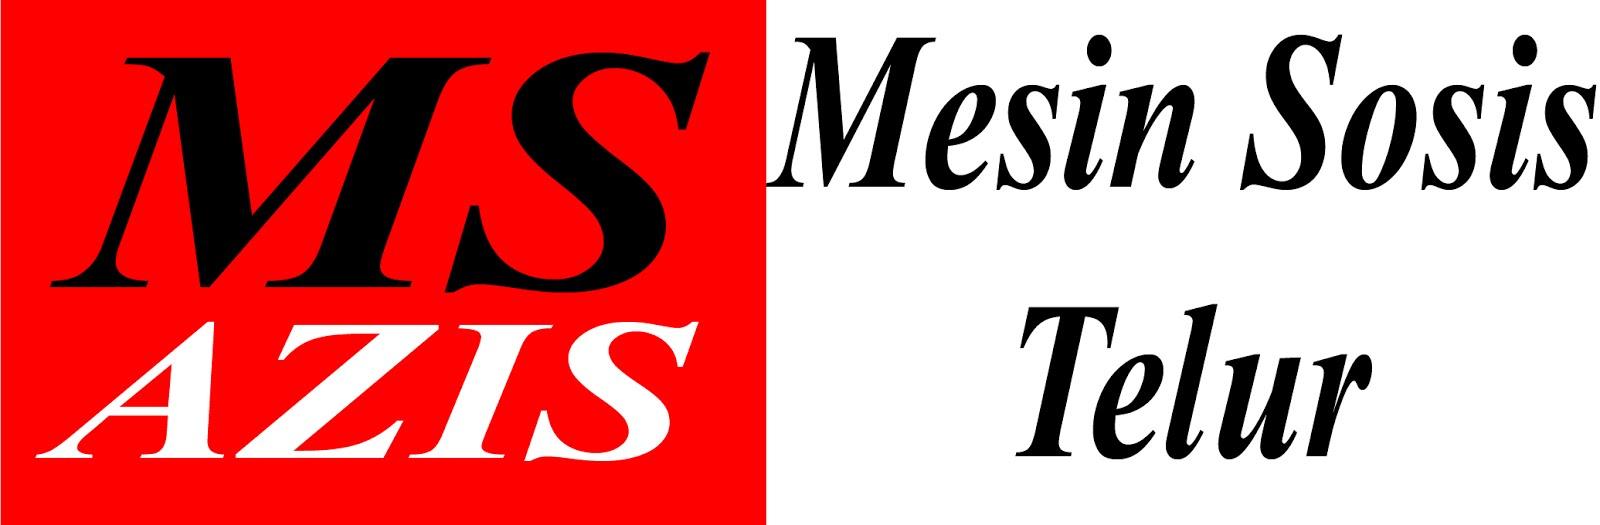 MESIN SOSIS TELUR AZIS